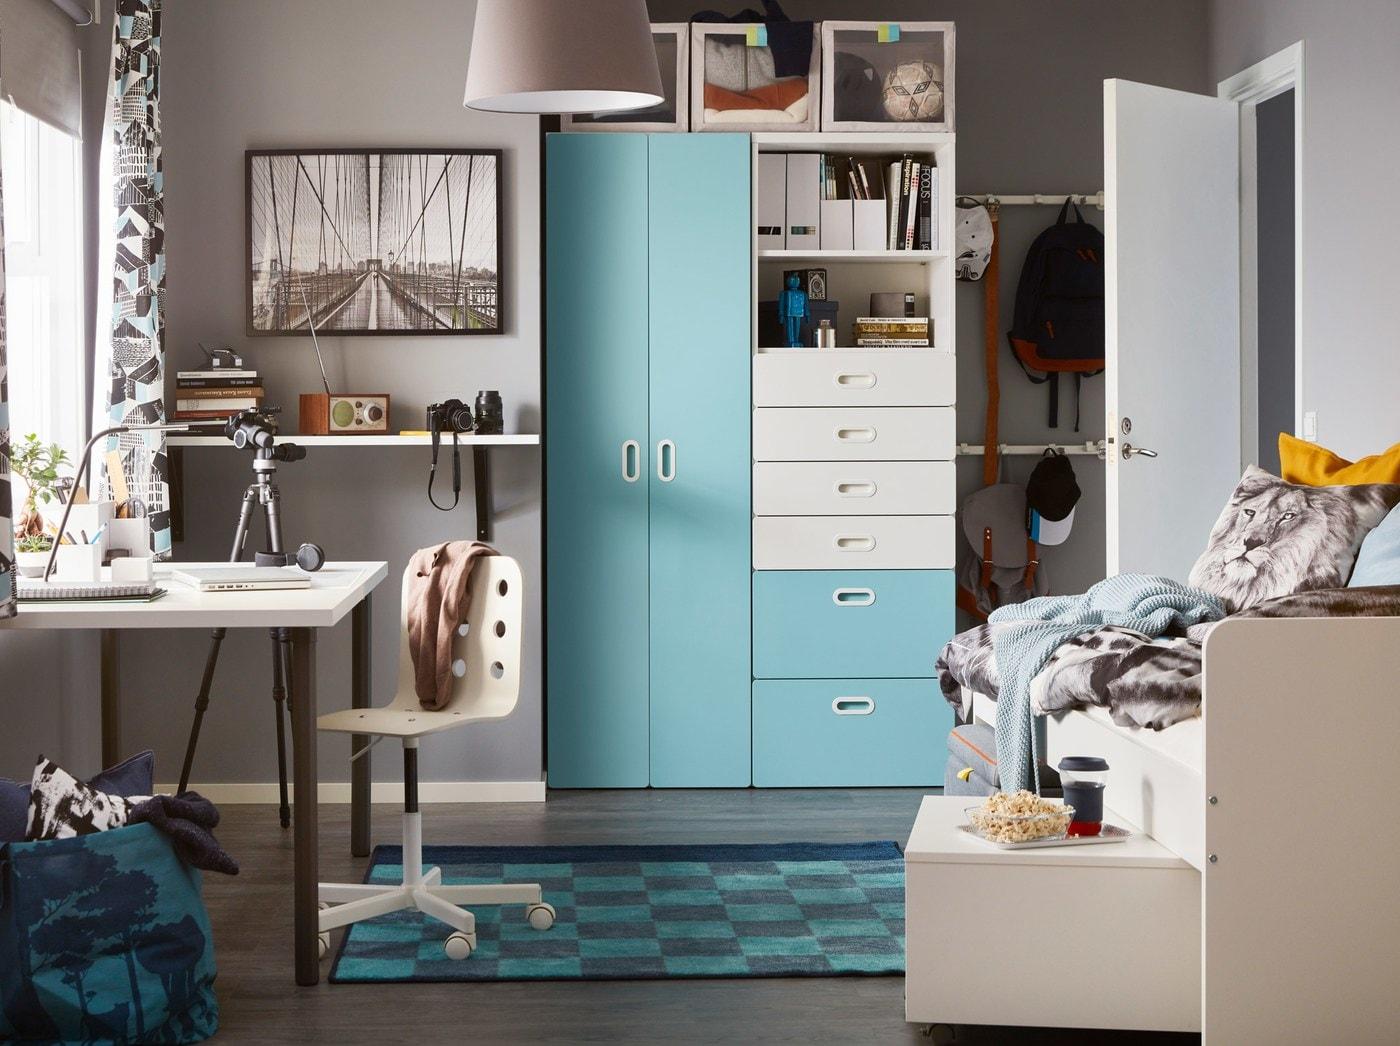 Fonkelnieuw Kinderkamergalerij - IKEA BX-71